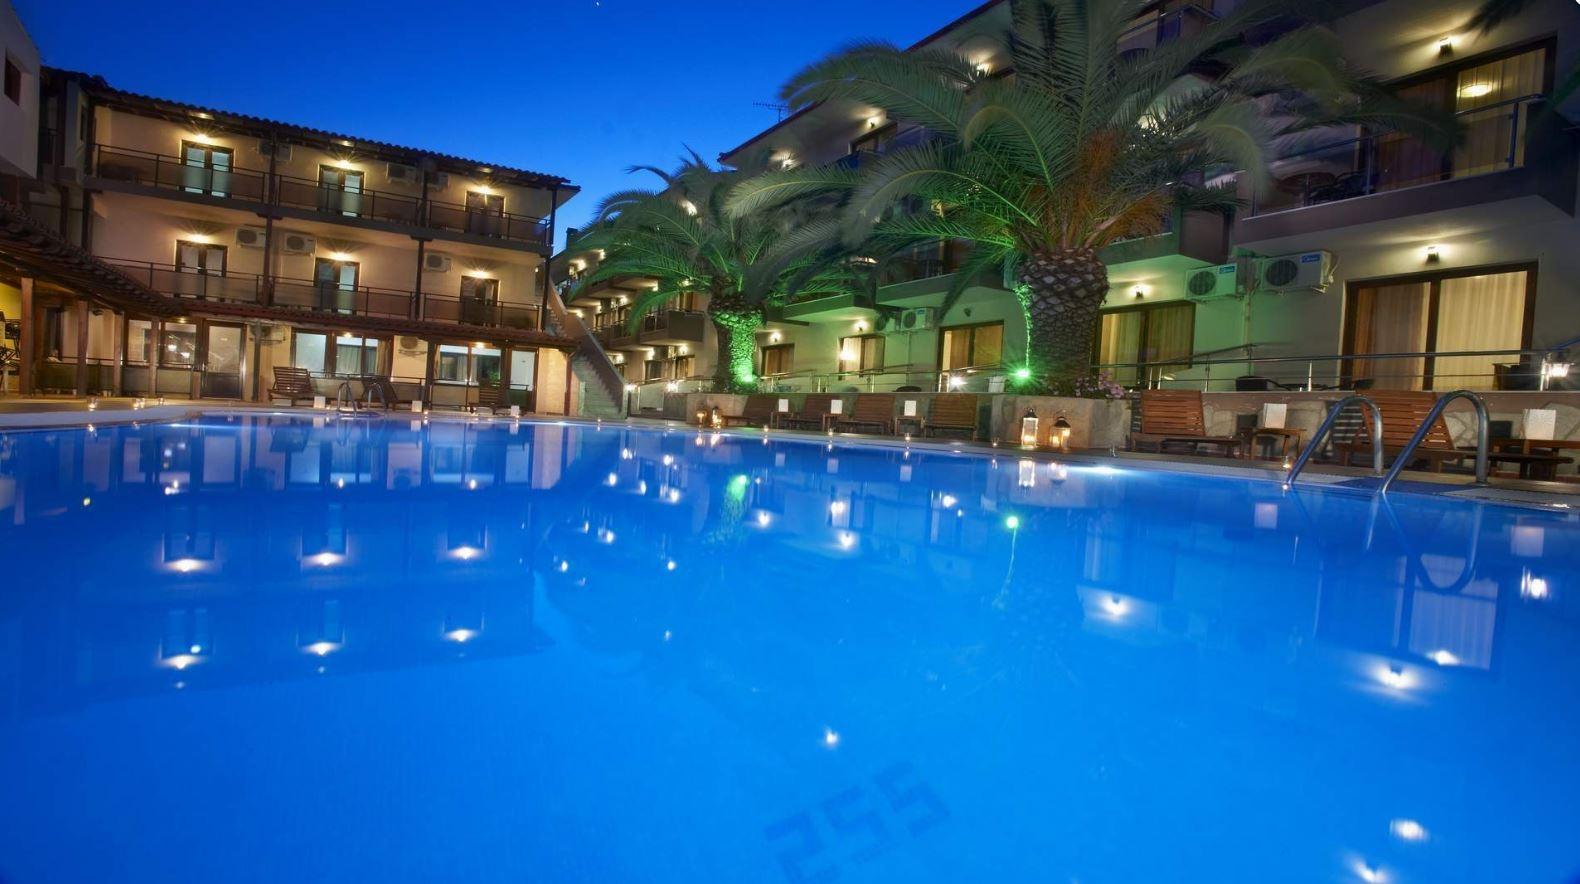 Simeon Hotel - Μεταμόρφωση Χαλκιδικής εικόνα